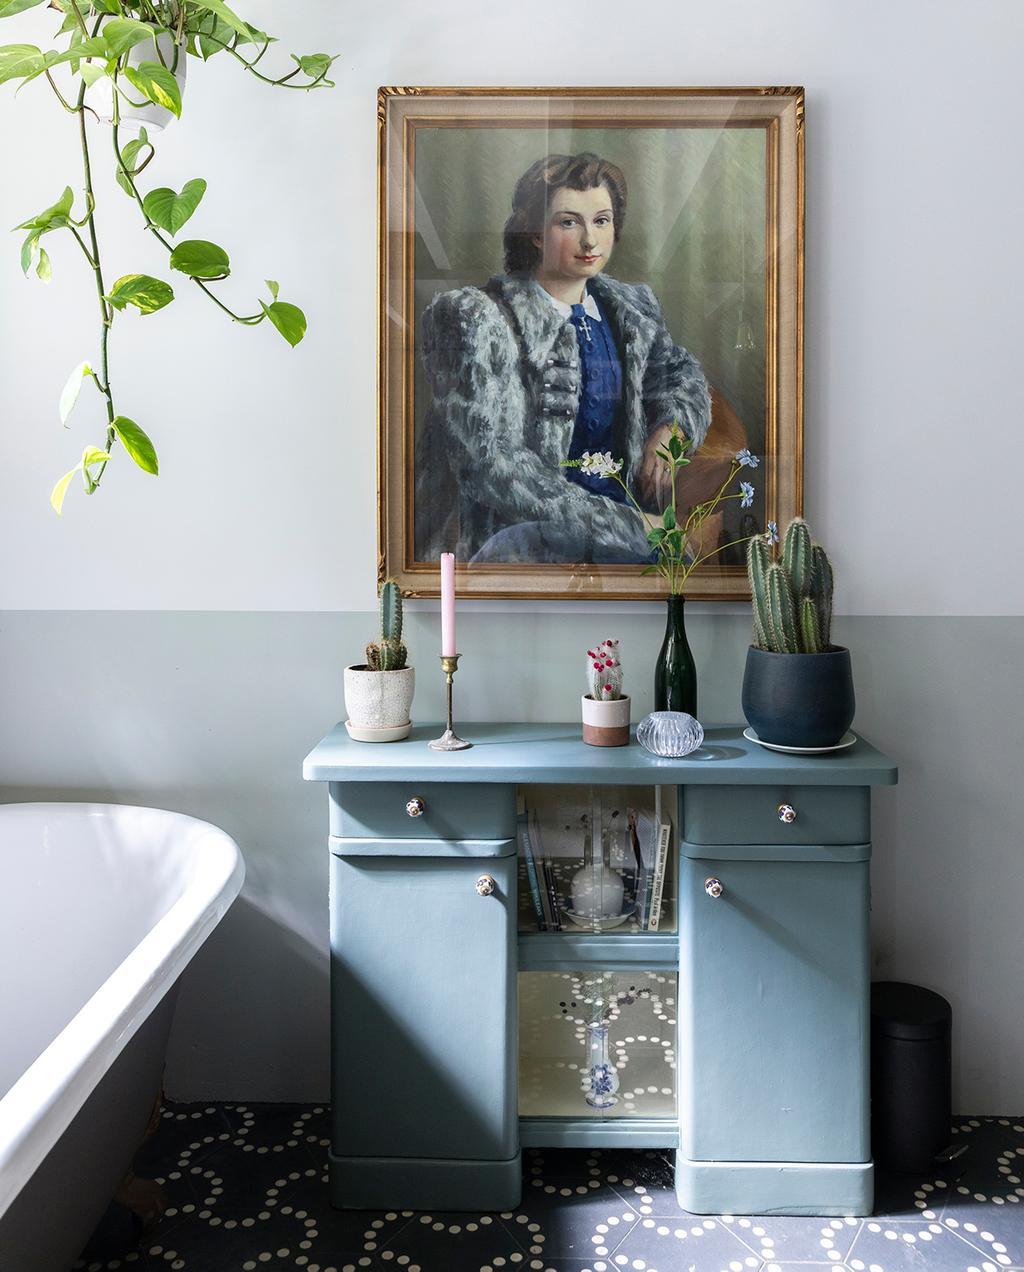 vtwonen 04-2020 | groene kaptafel in badkamer met patroontegels Amsterdam